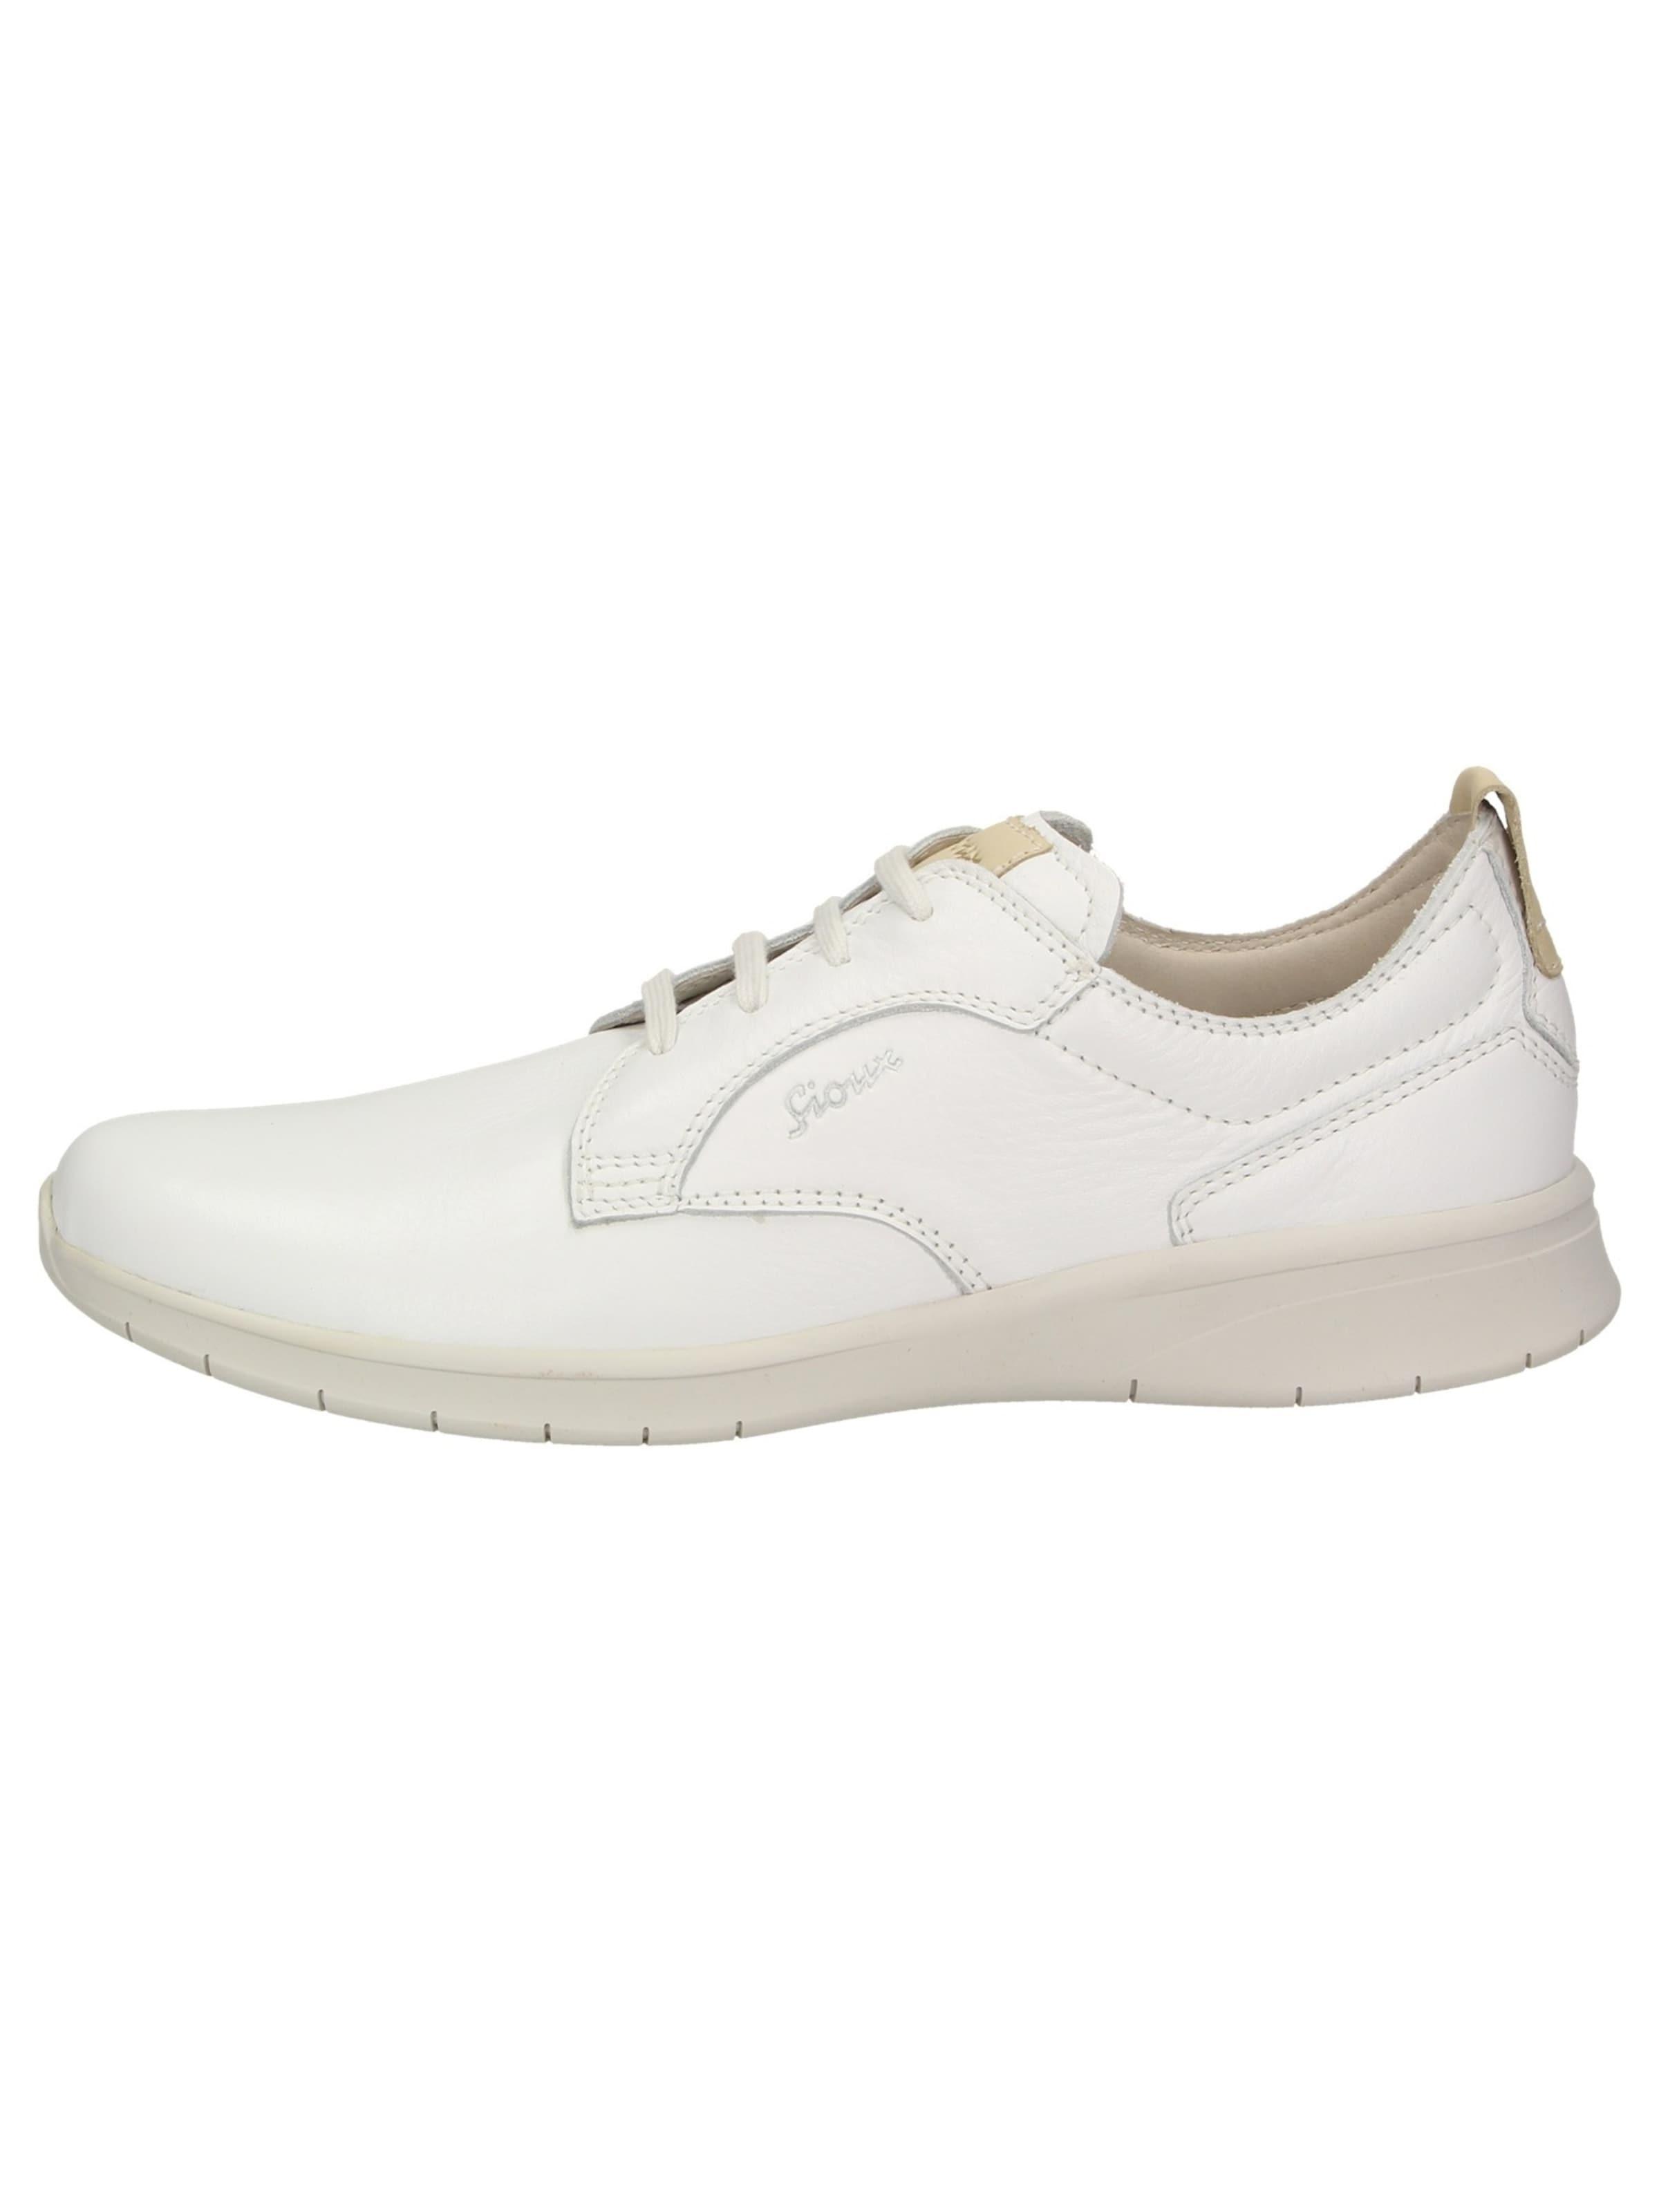 Sioux 700 xl' Weiß In Sneaker 'heimito OX8Pn0wk